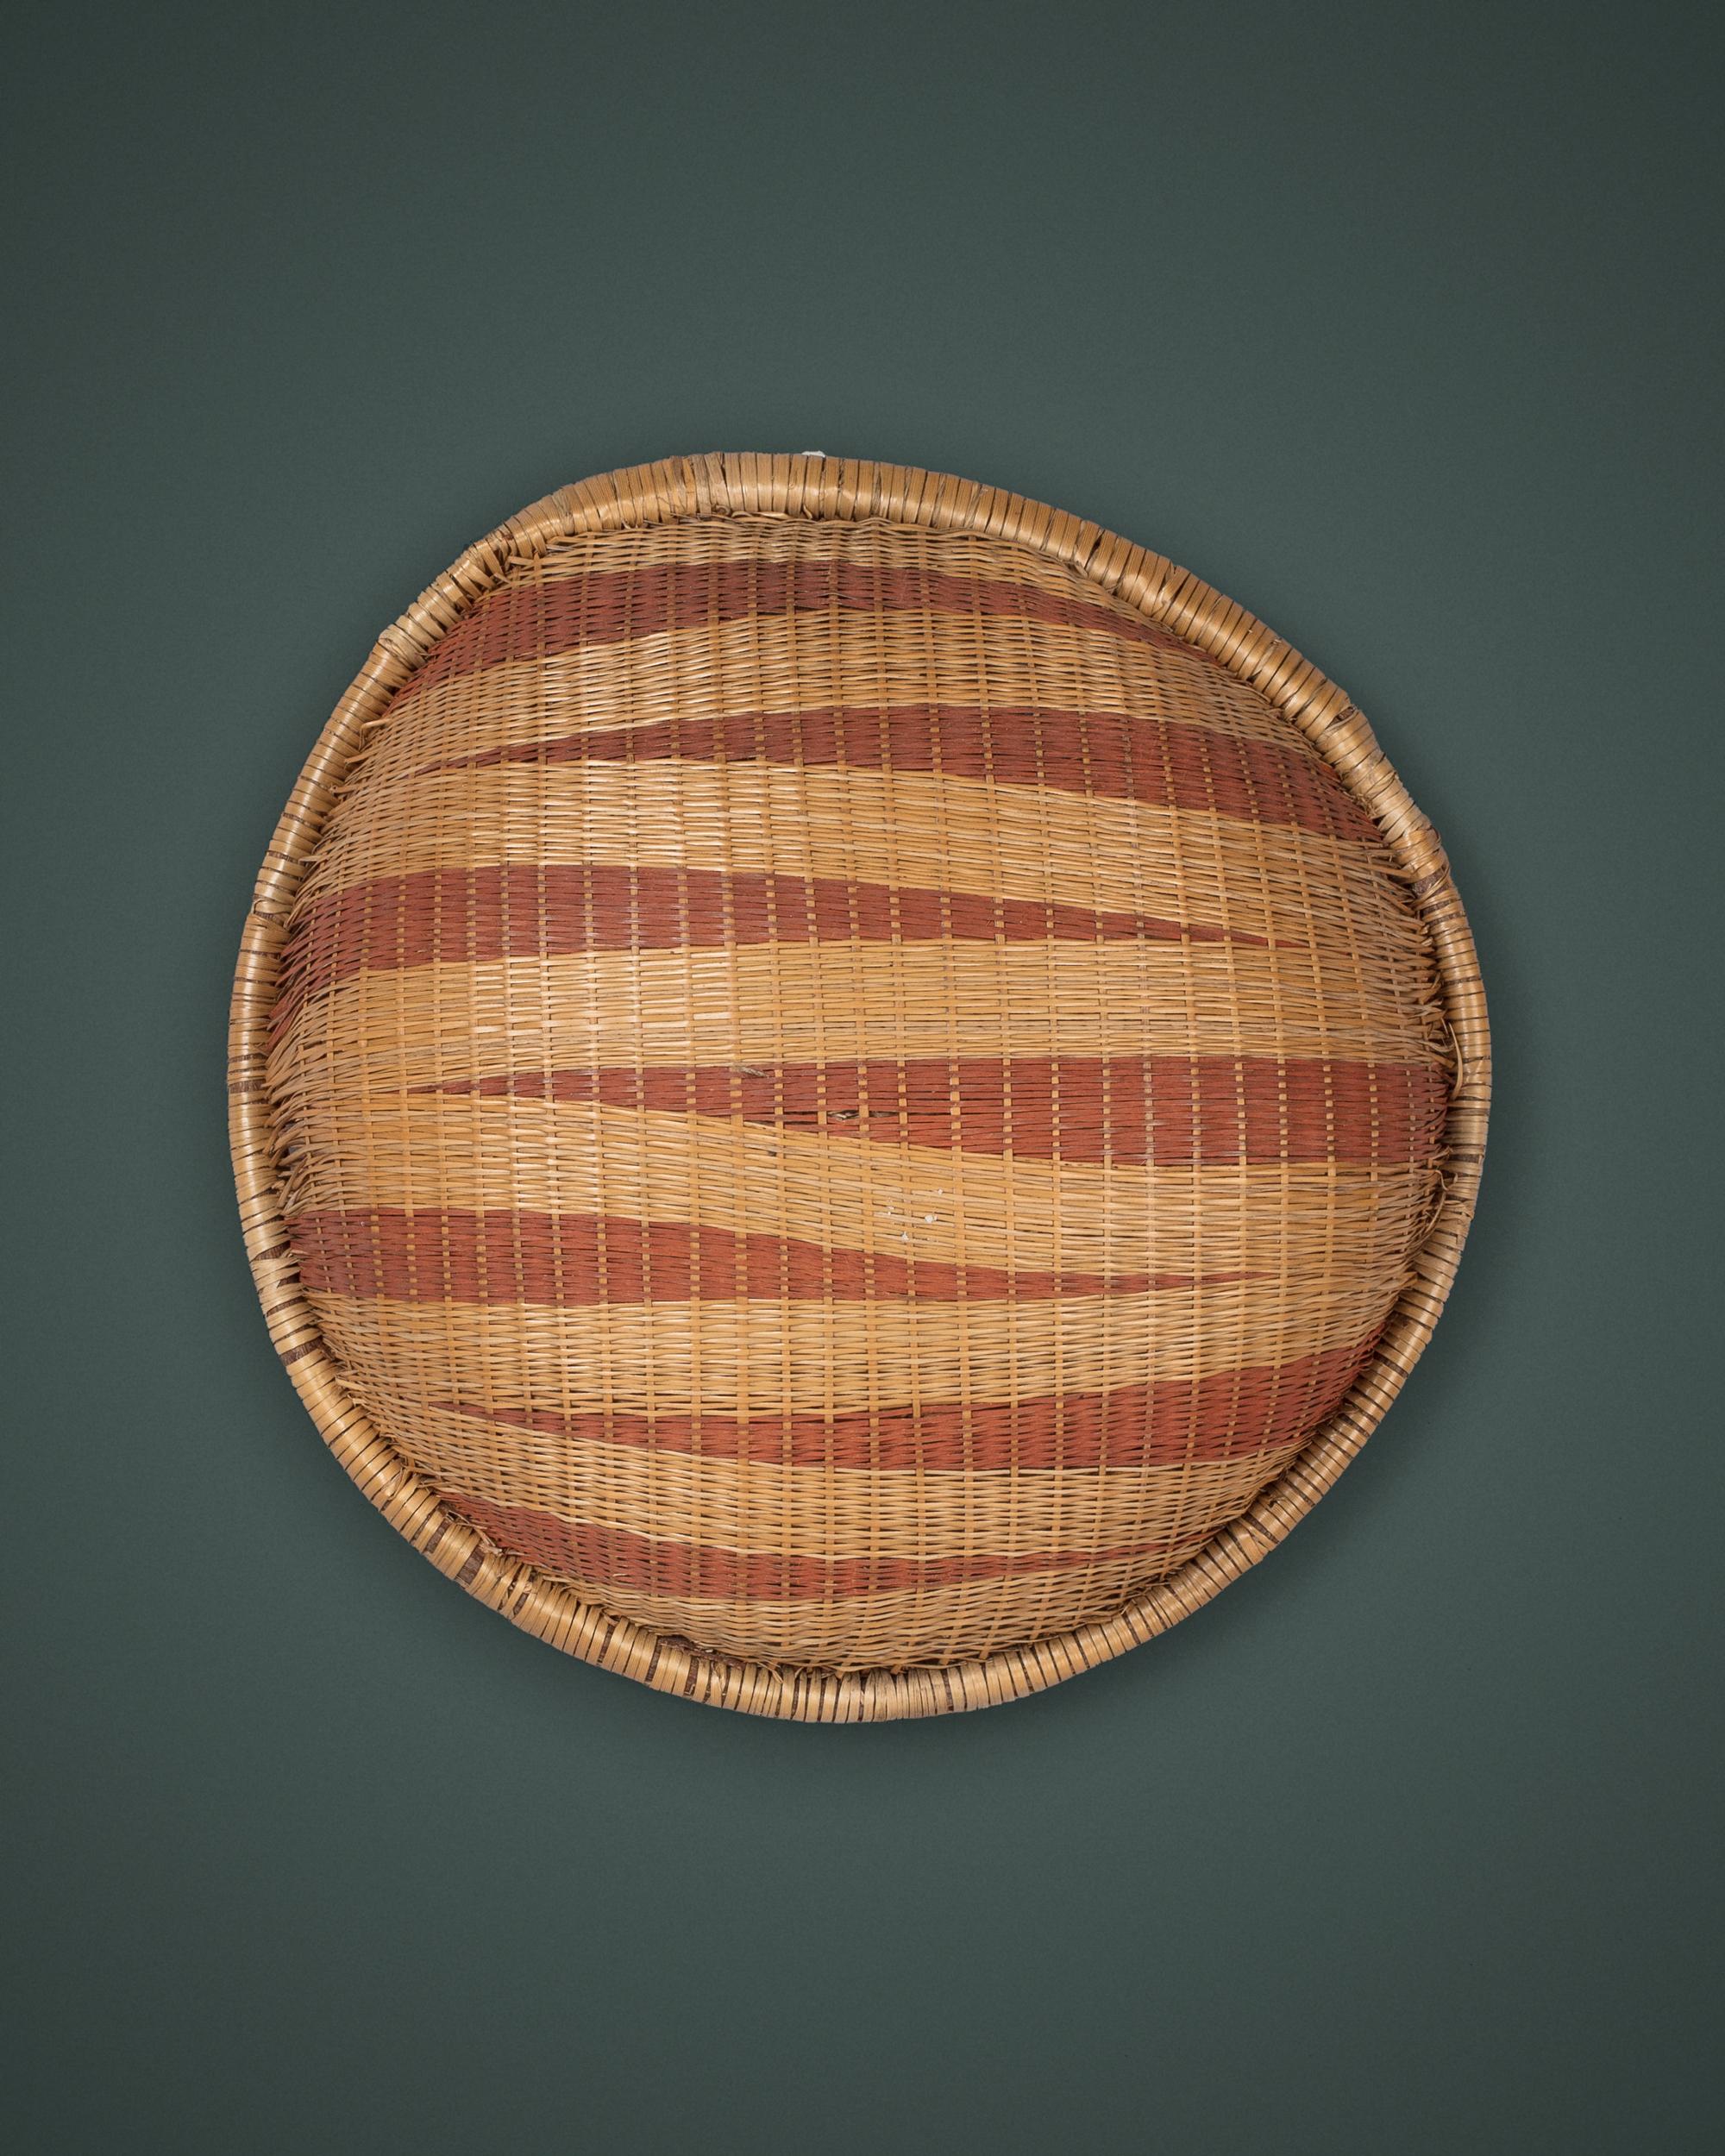 A Double-Sided Agakoko, Gift Plate